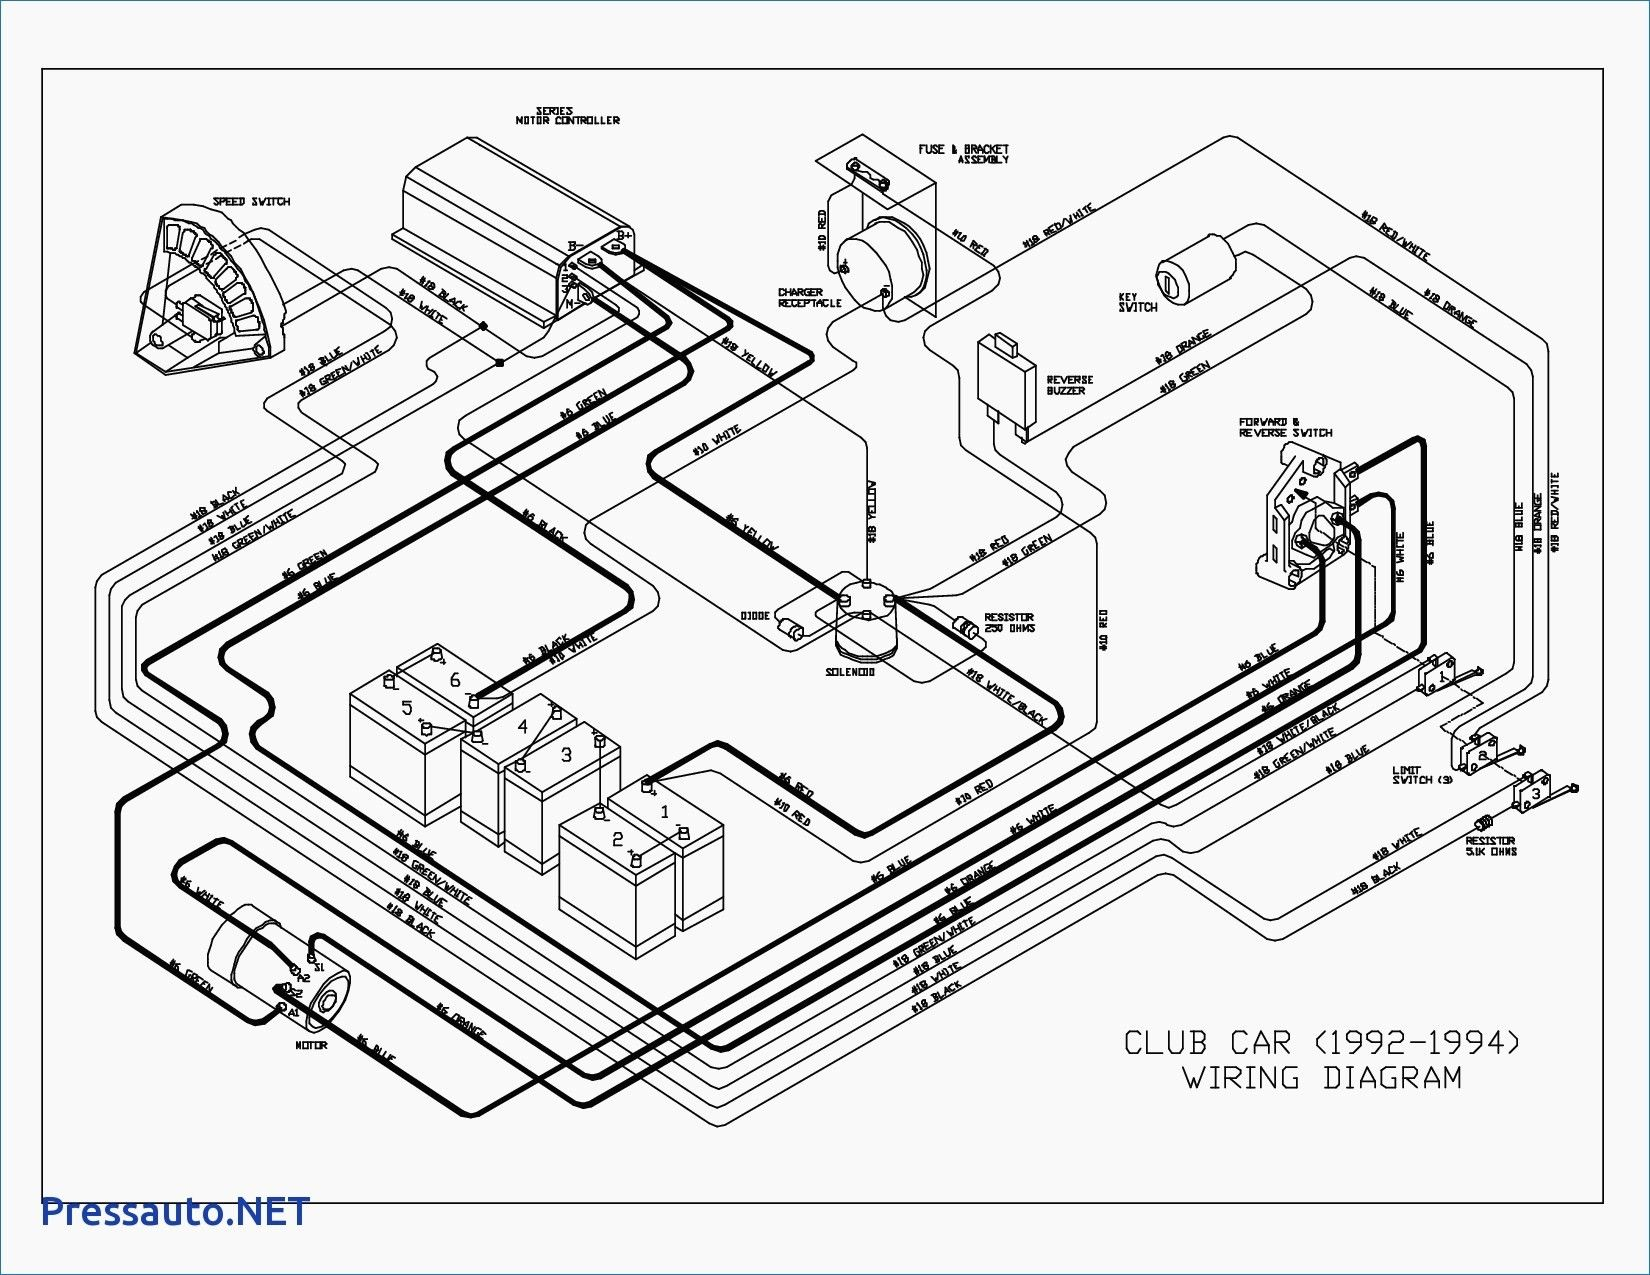 1984 Ez Go Golf Cart Wiring Diagram from i.pinimg.com